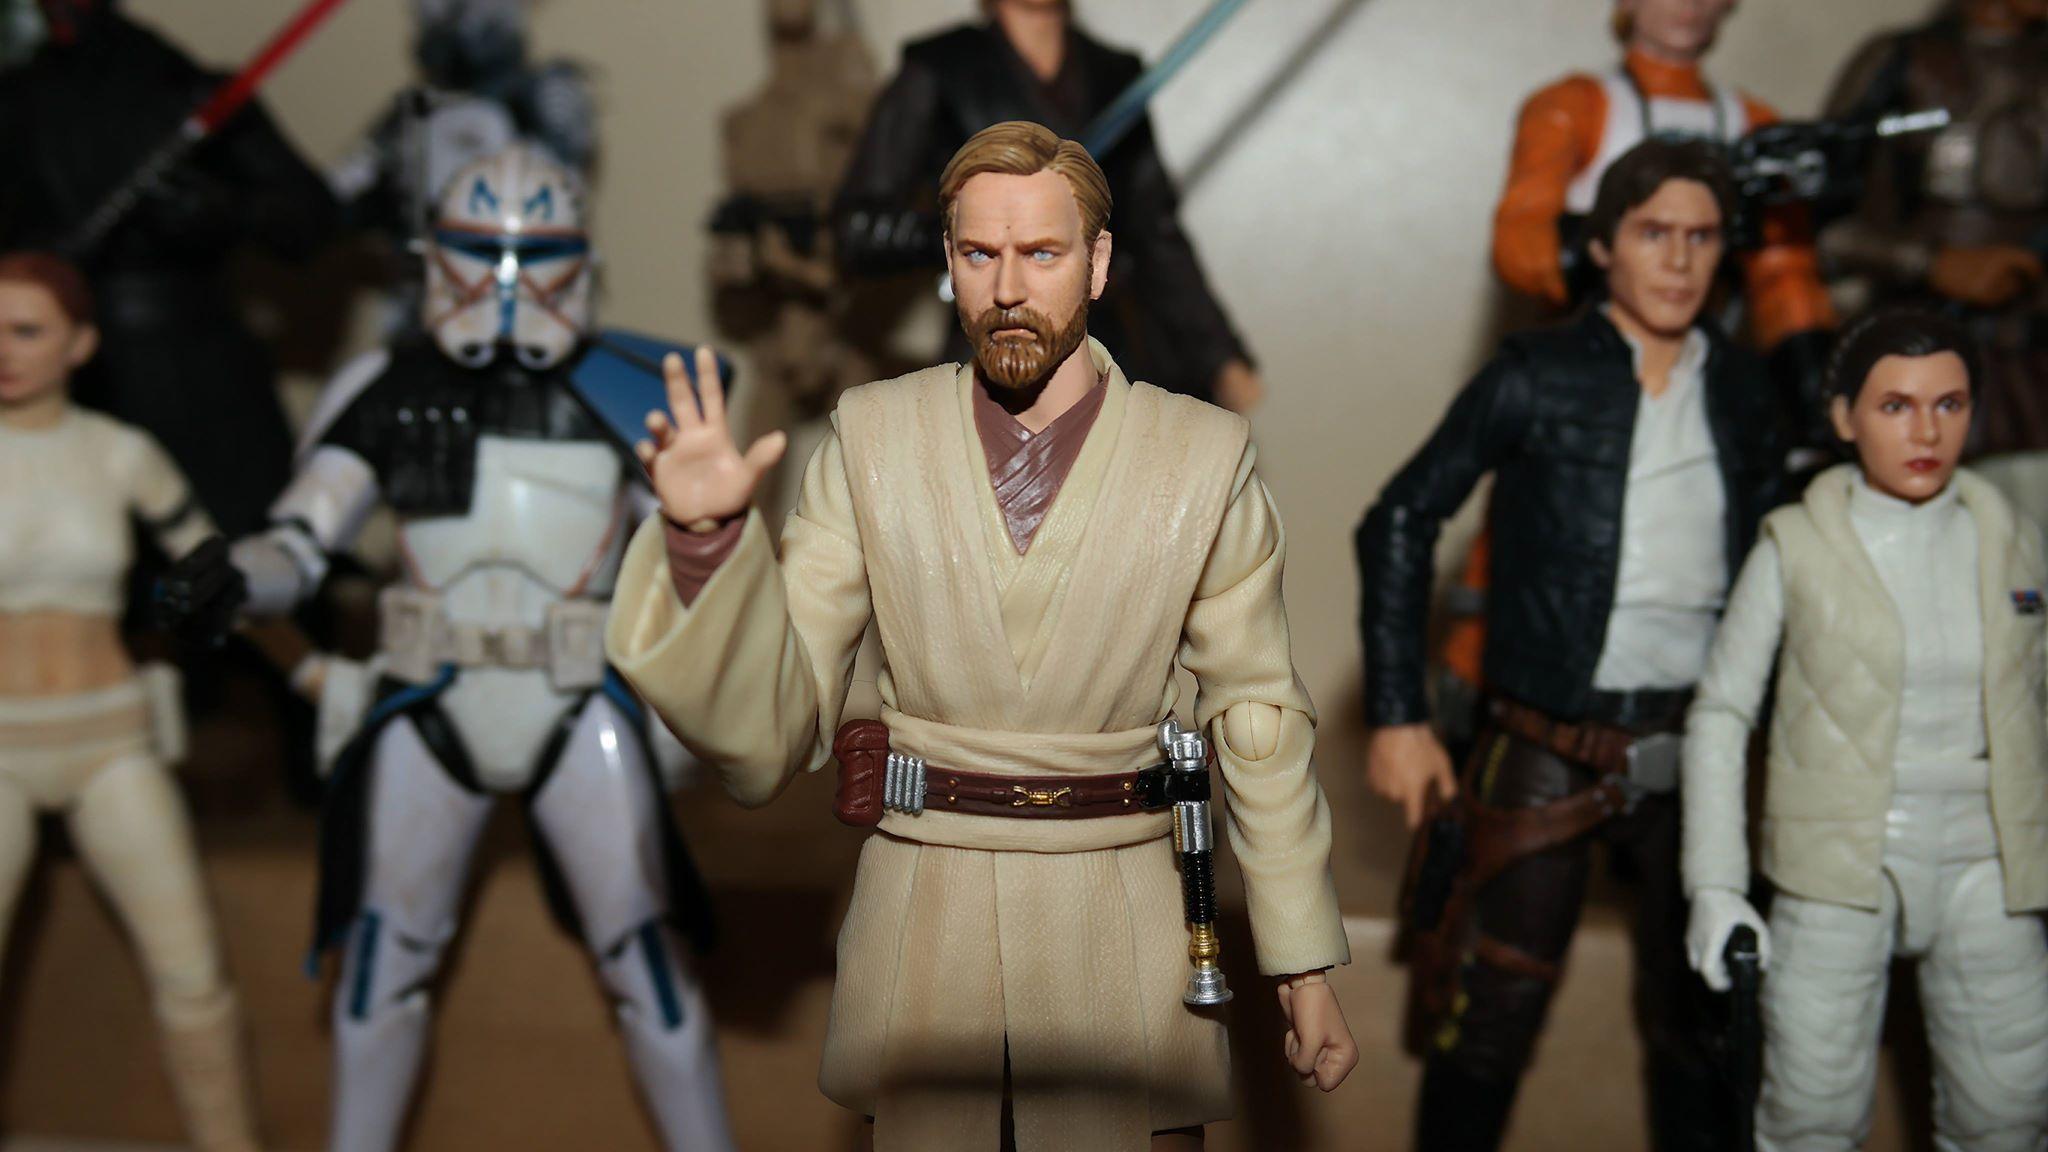 S H Figuarts Obi Wan Kenobi Review 4 Future Of The Force